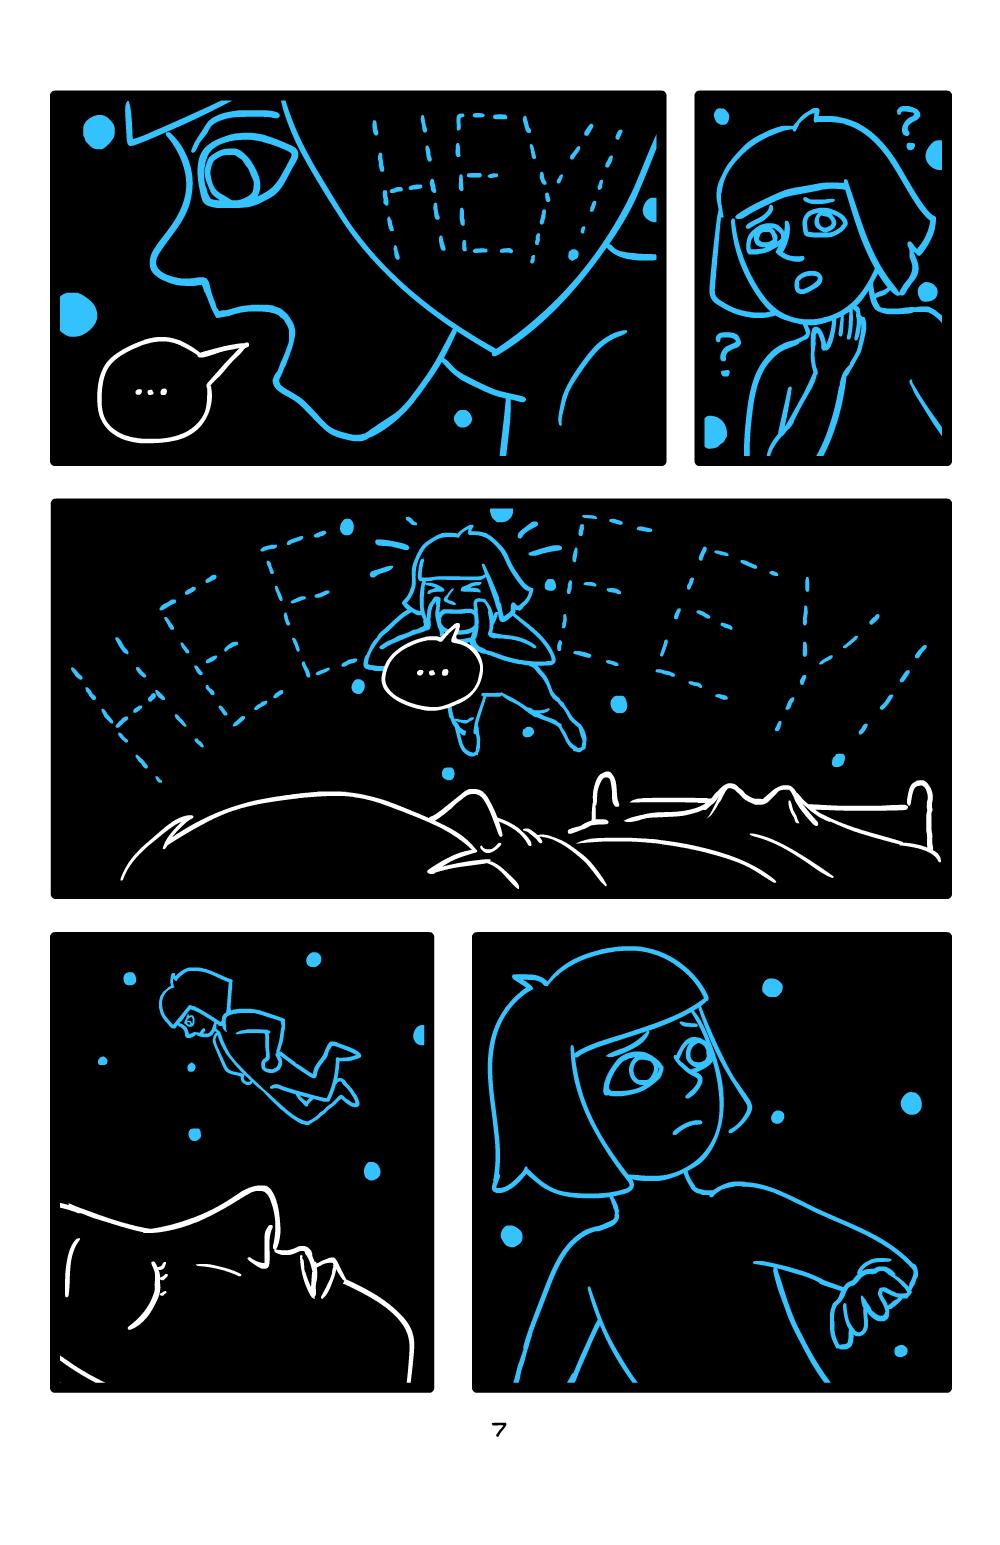 The-Body-Sleeps-9-15-07.jpg